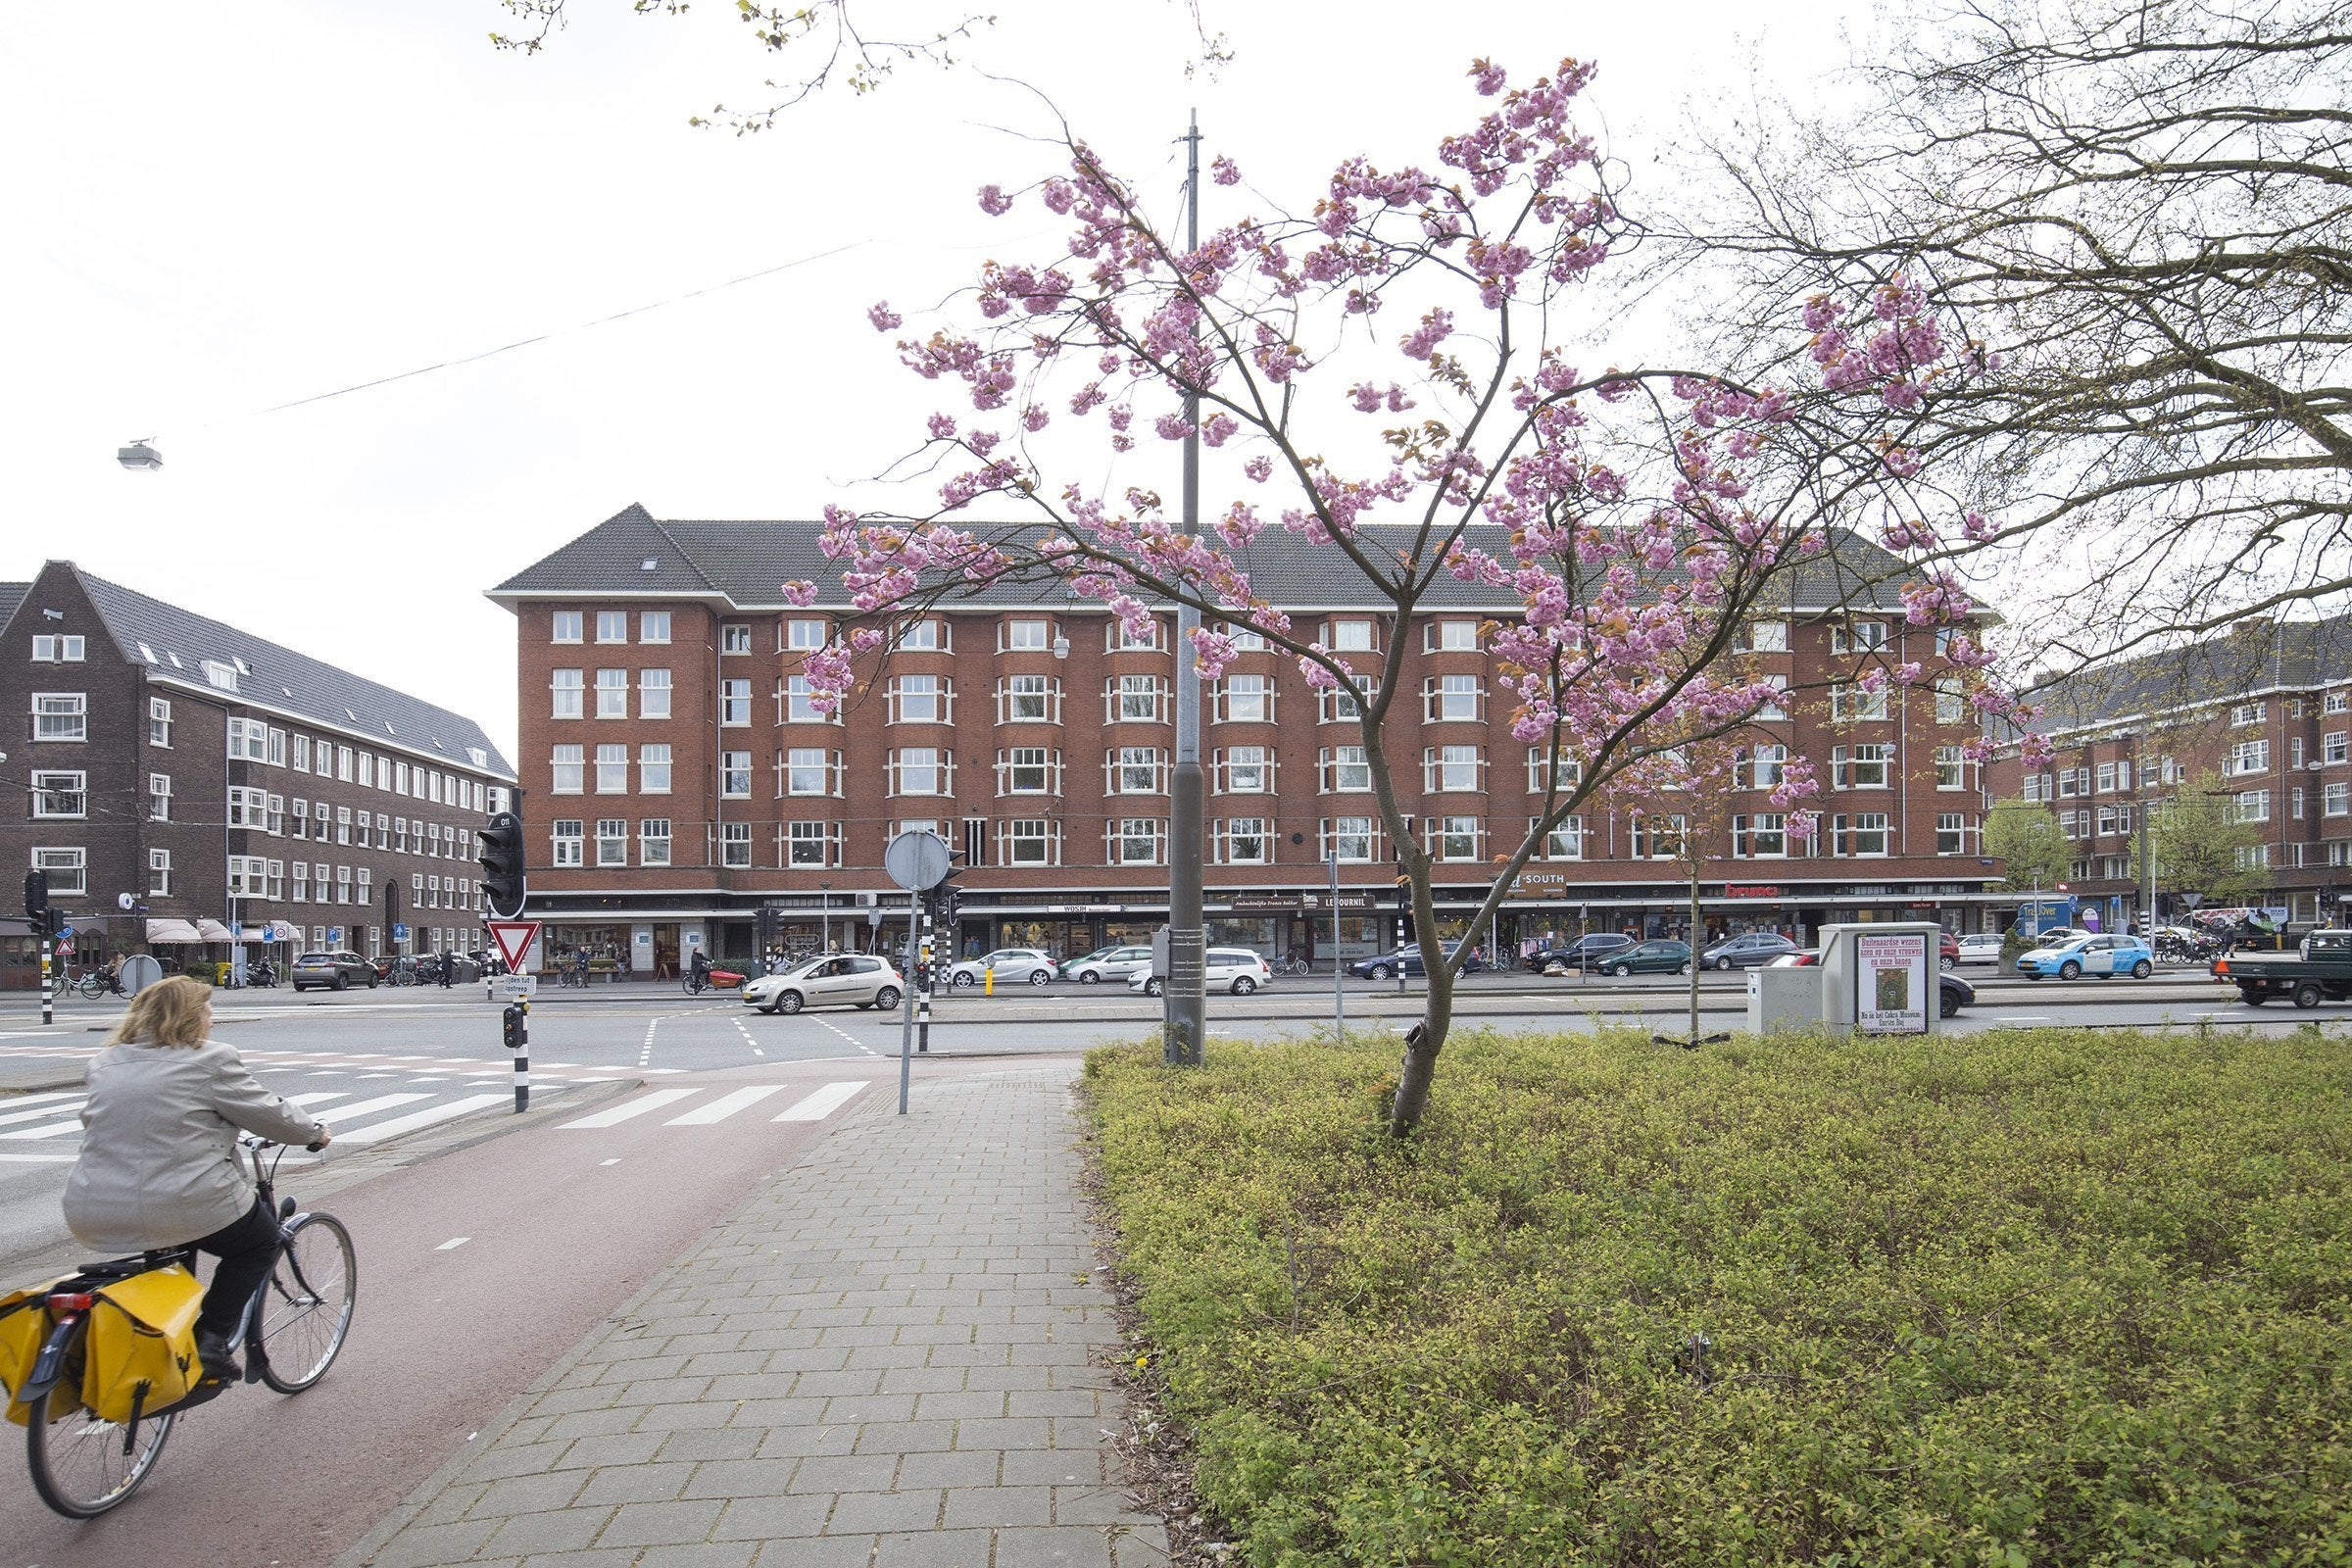 https://public.parariusoffice.nl/15/photos/huge/51221817.1494850057-546.jpg